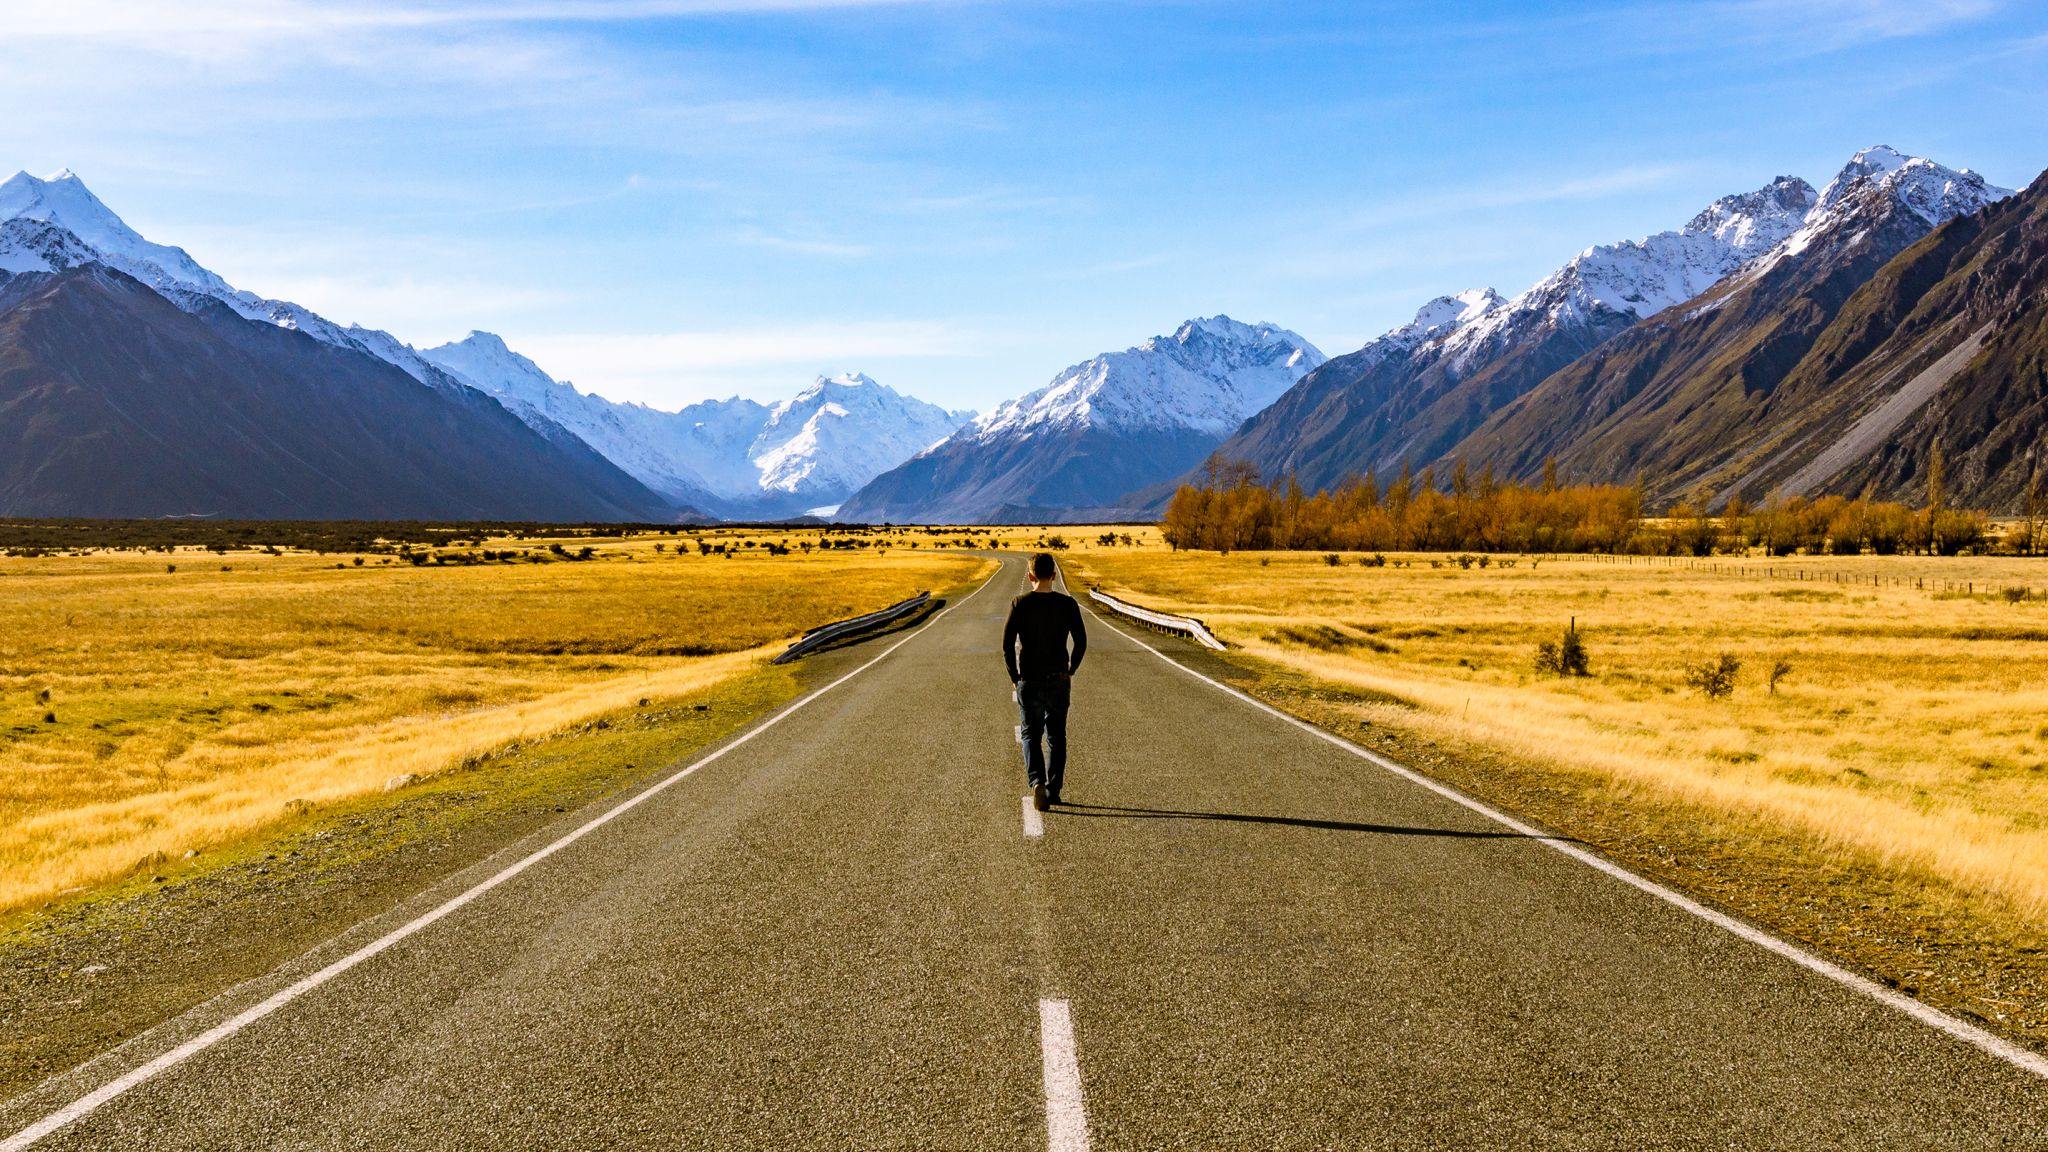 Road to Aoraki / Mount Cook, New Zealand